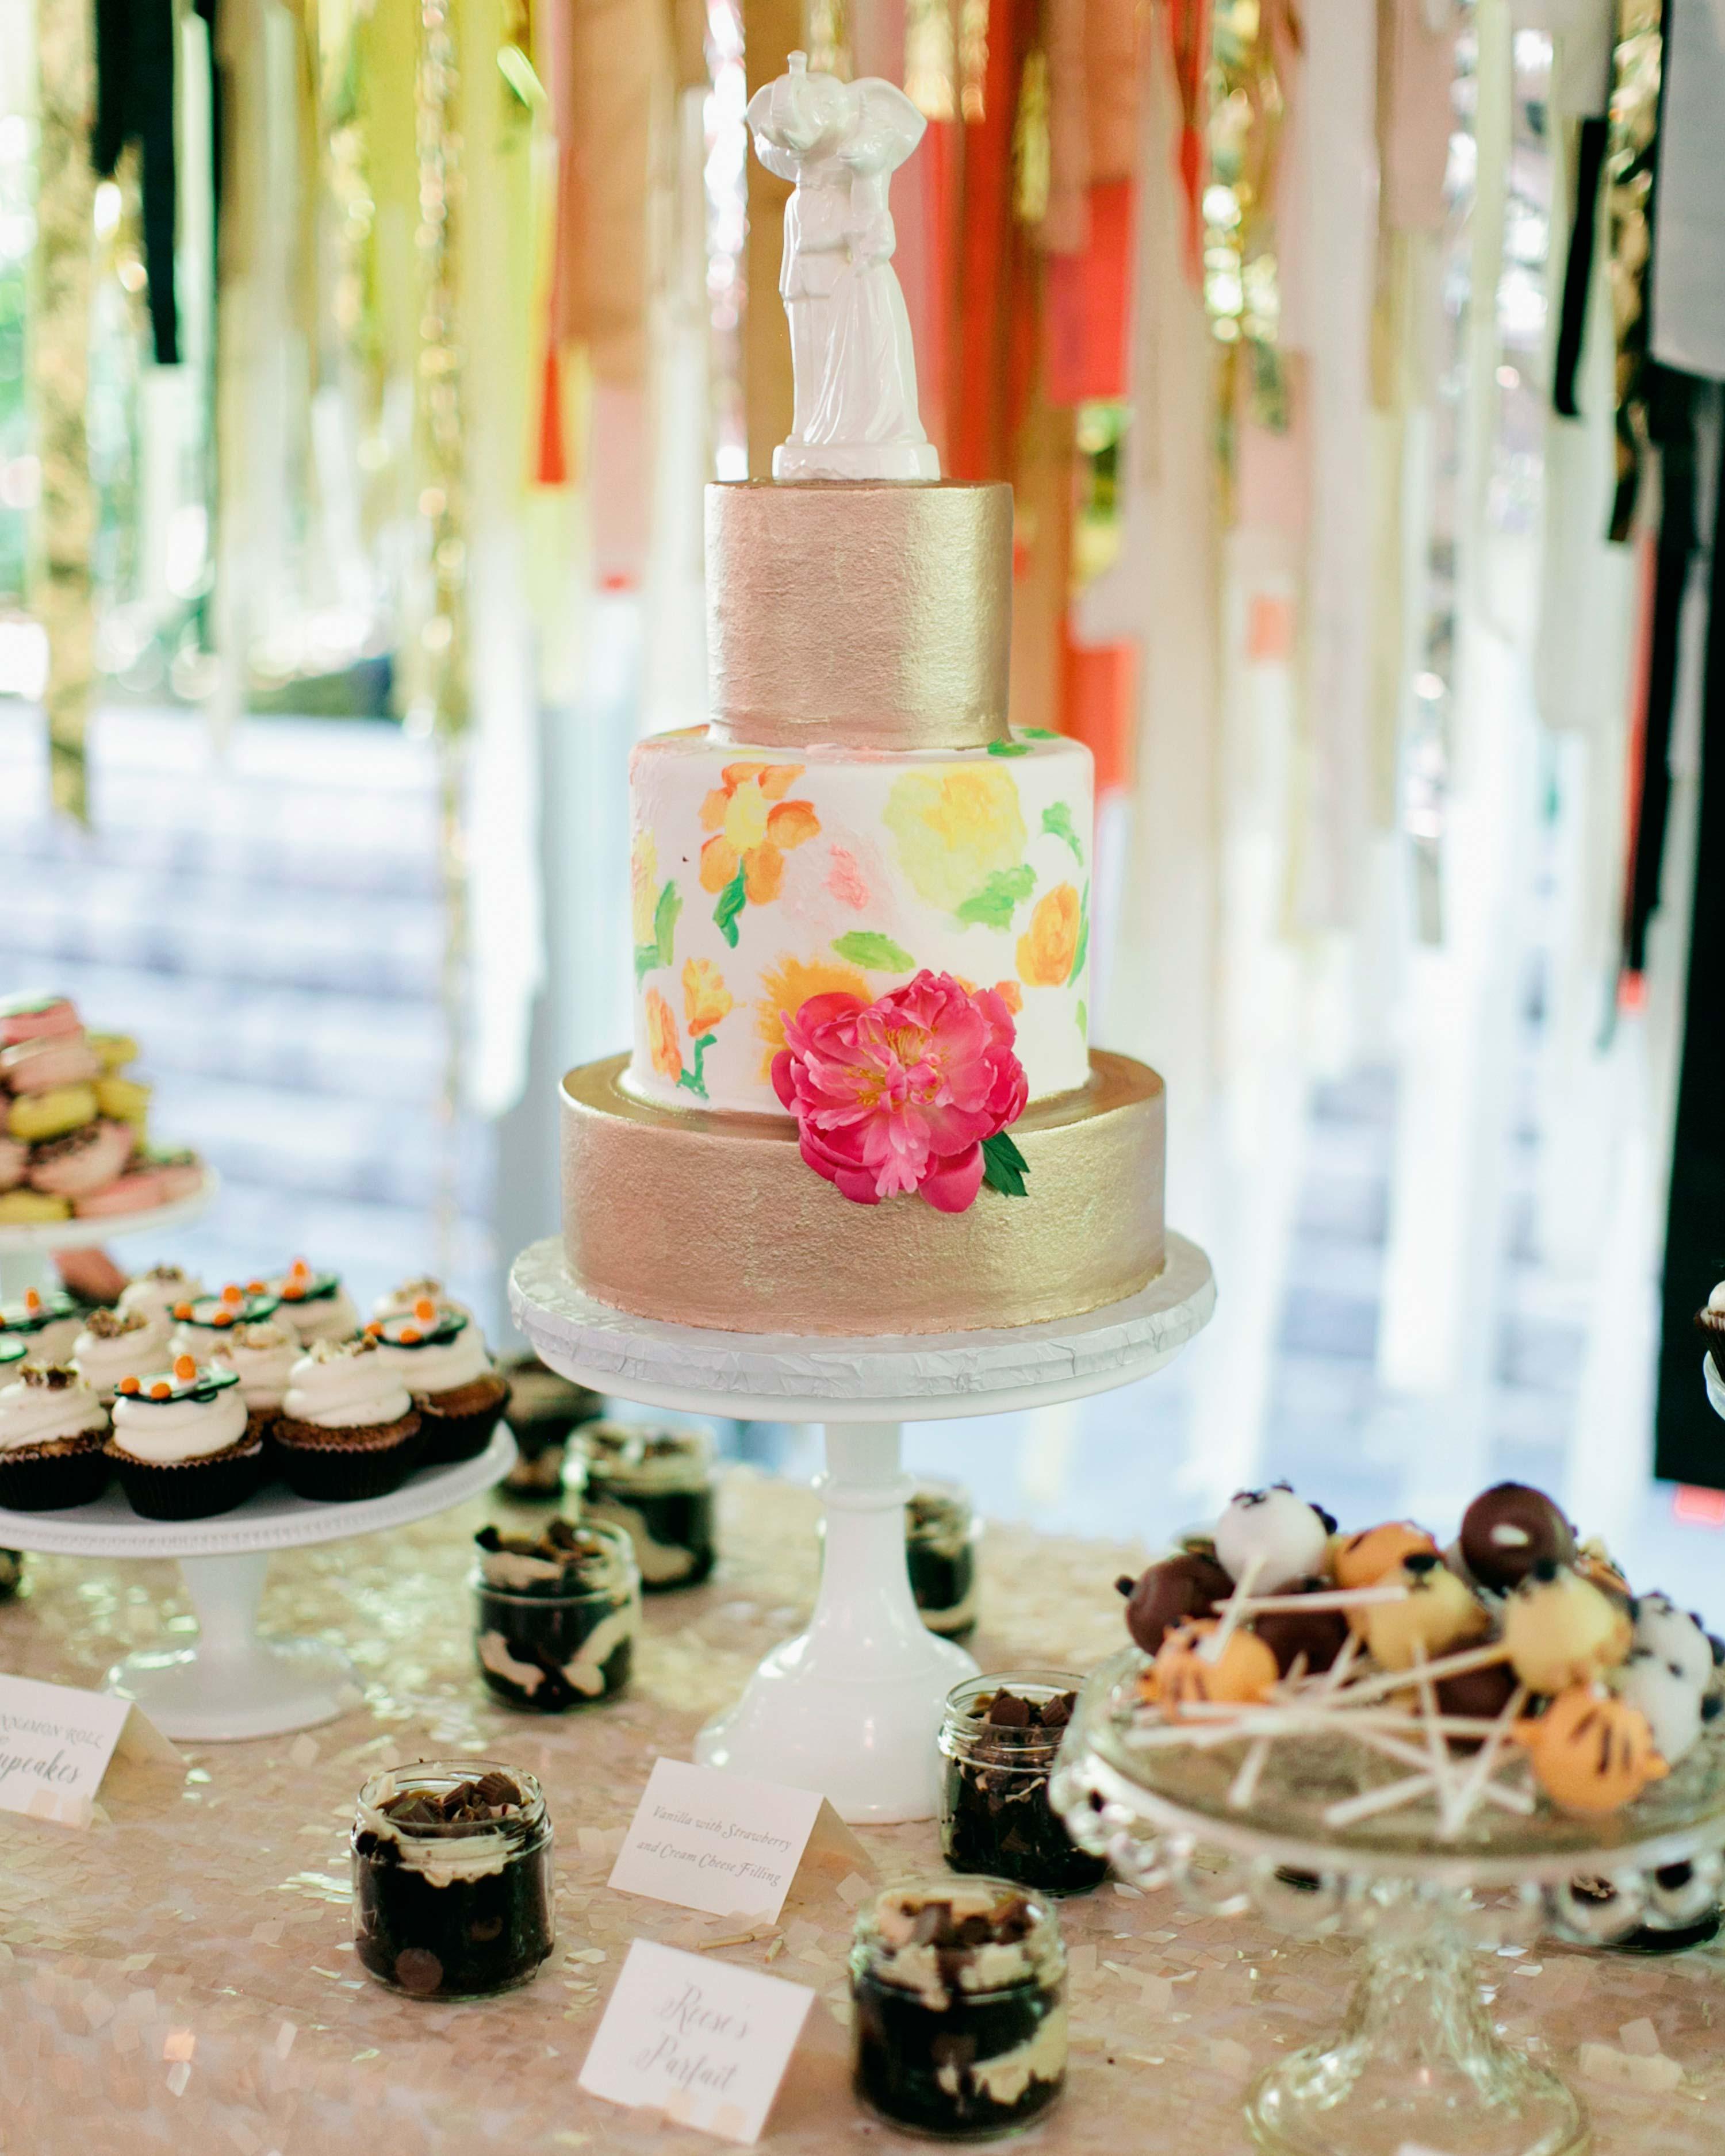 holly-john-wedding-texas-desserts-075-s112833-0516.jpg